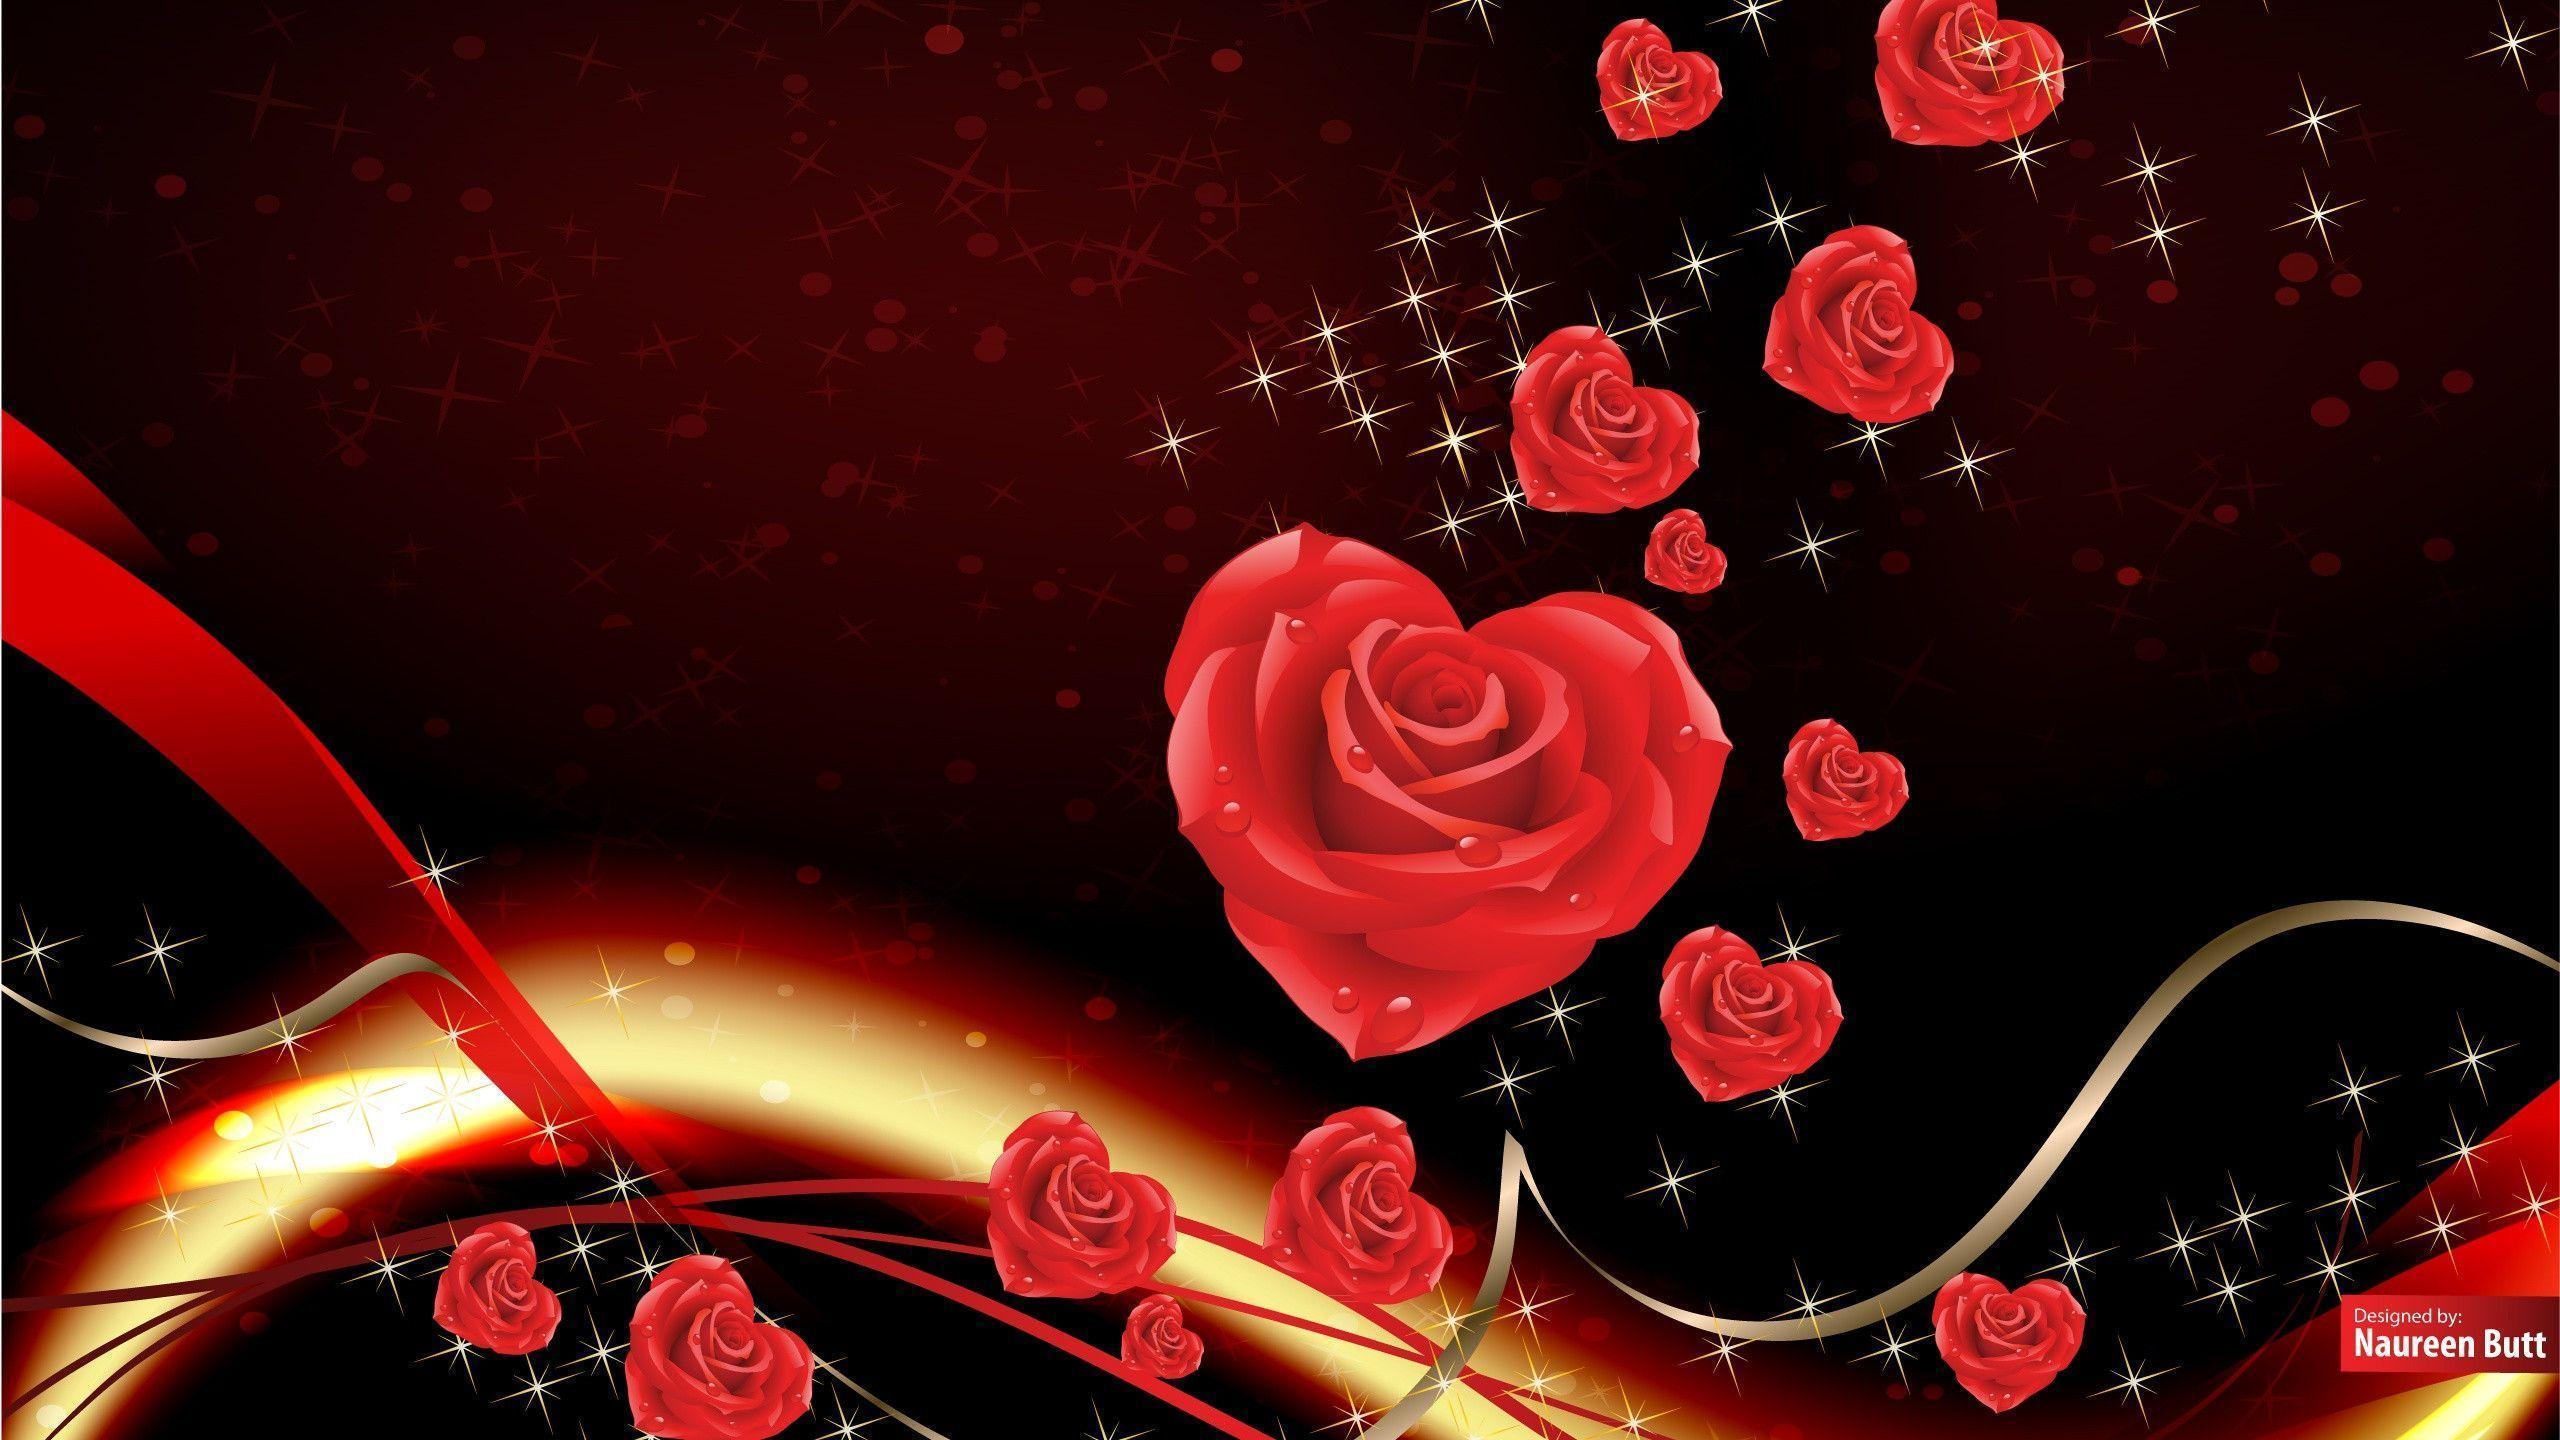 Free valentines desktop wallpapers wallpaper cave - San valentin desktop backgrounds ...